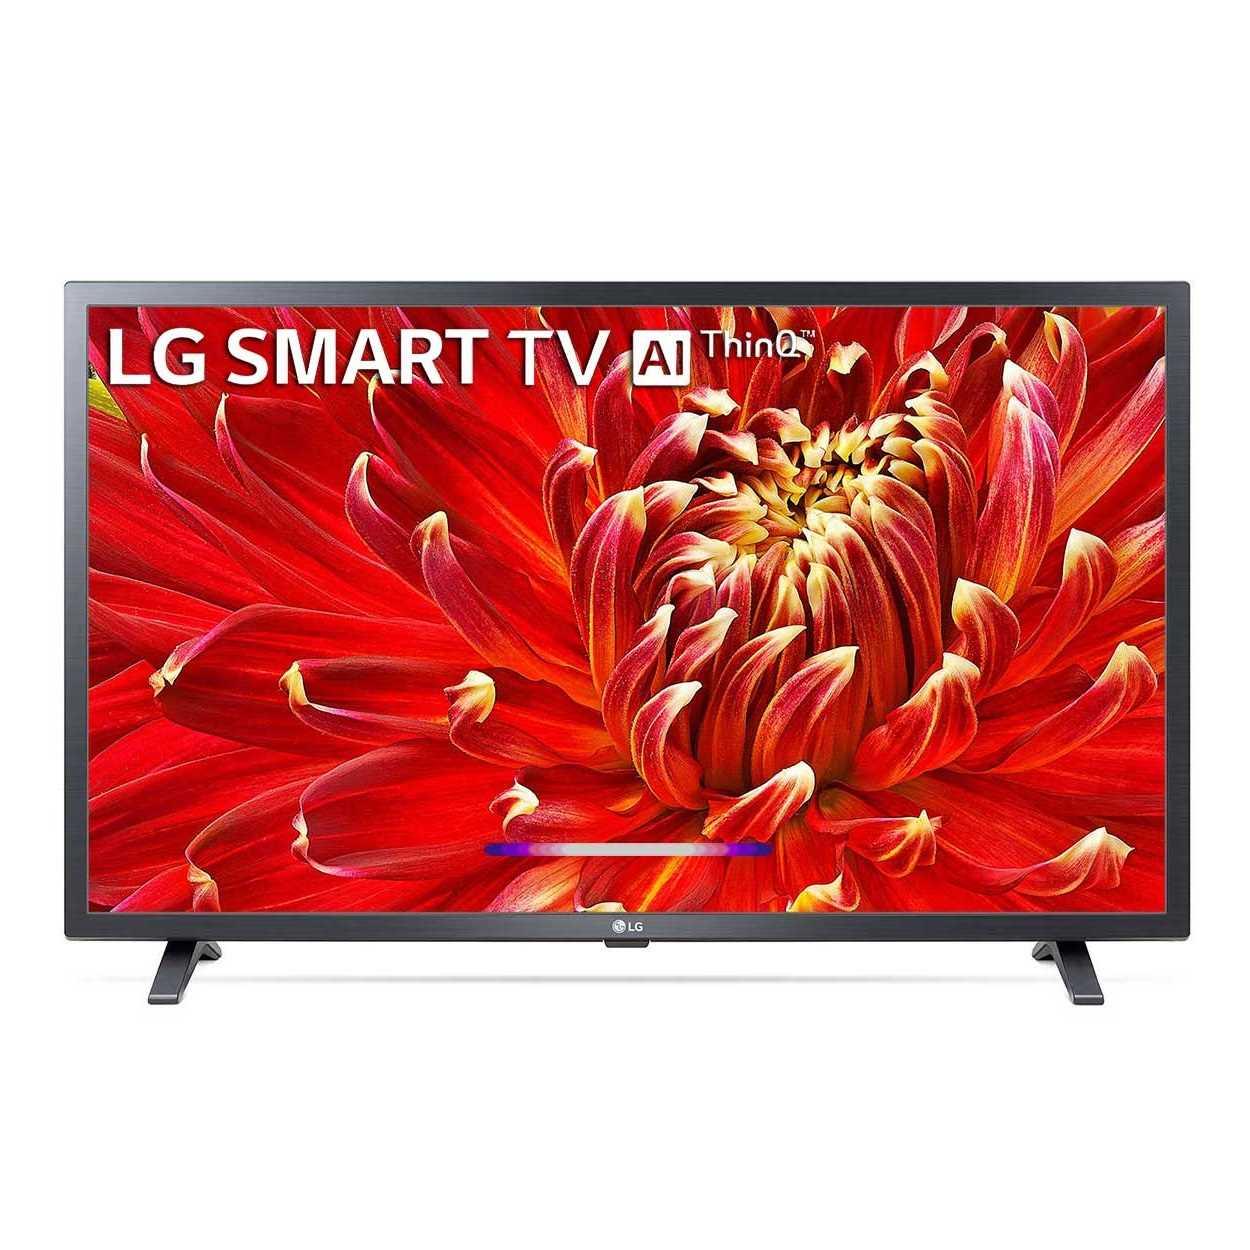 LG 32LM636BPTB 32 Inch HD Ready Smart LED Television